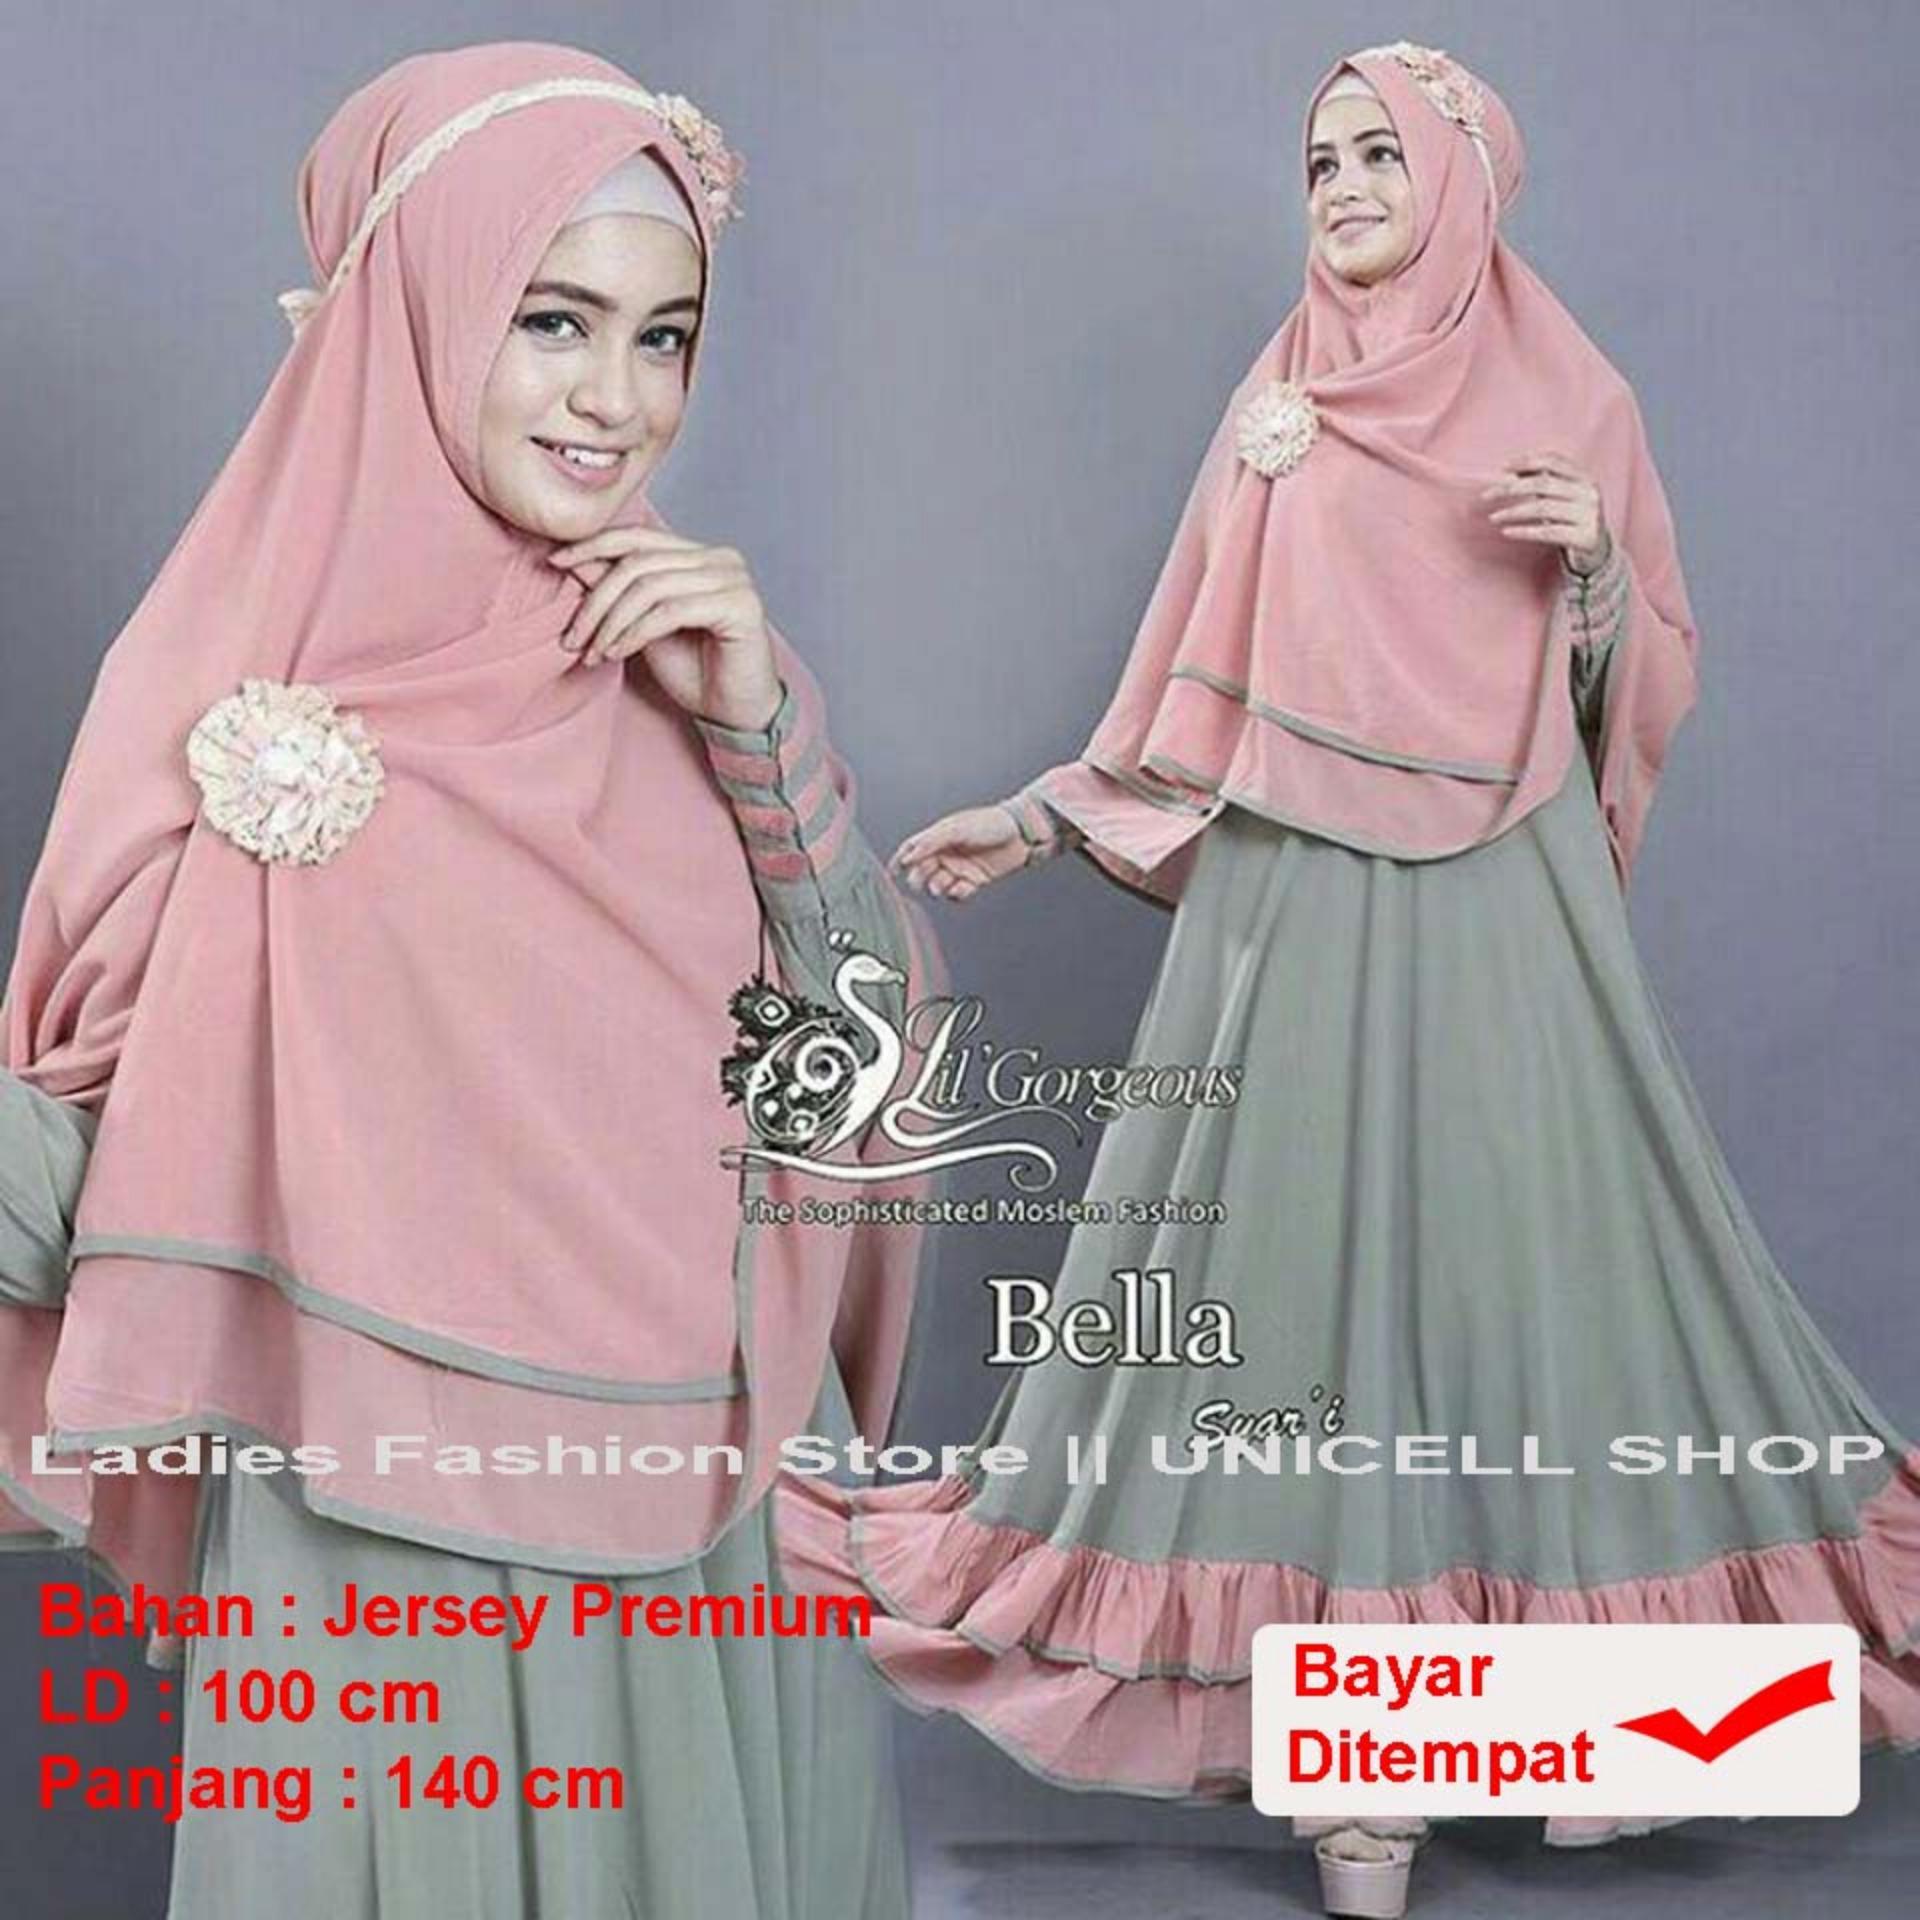 UC Baju Gamis Dress Muslim Syari Wanita EYYA Polos (LLABE) 1N - Hijau ( Dapat Jilbab ) / Hijab Muslimah / Baju Muslimah Wanita / Syari Syari'i Muslim / Gaun Muslim / Long Dress Muslimah Wanita